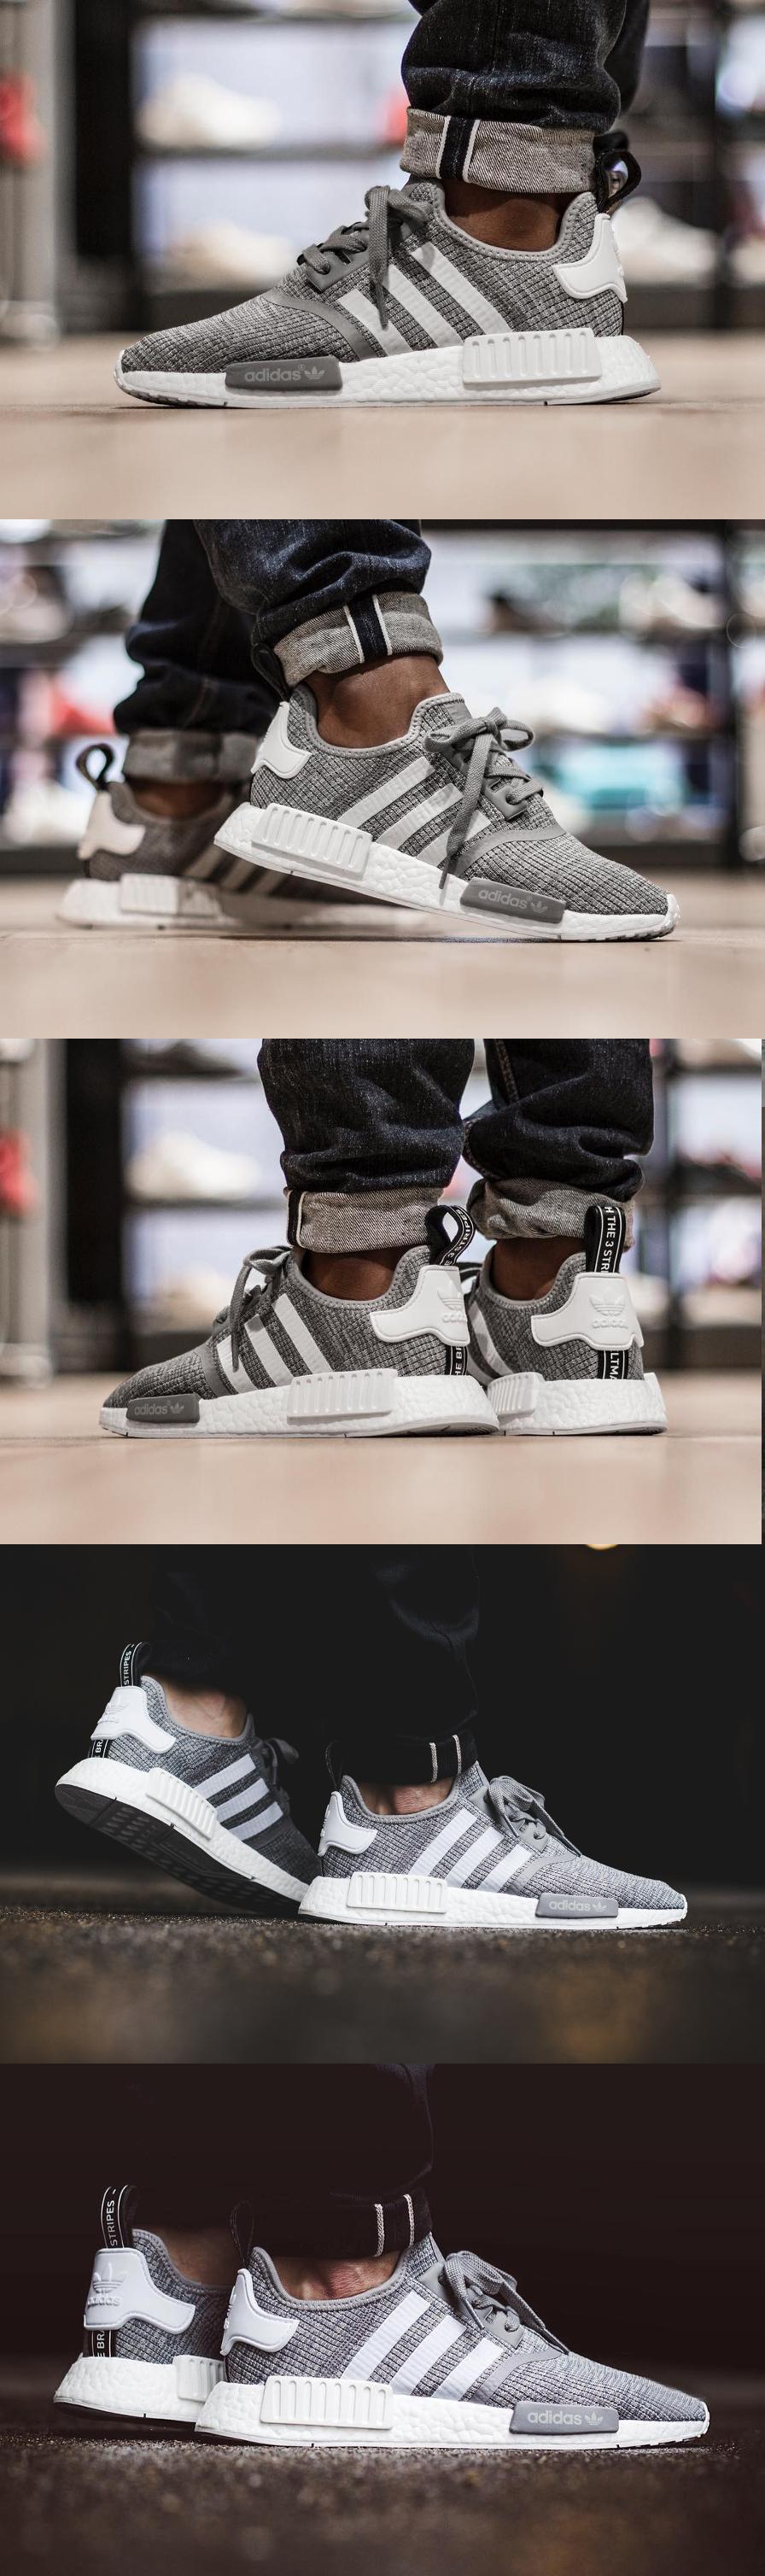 zalando adidas nmd xr1 pk